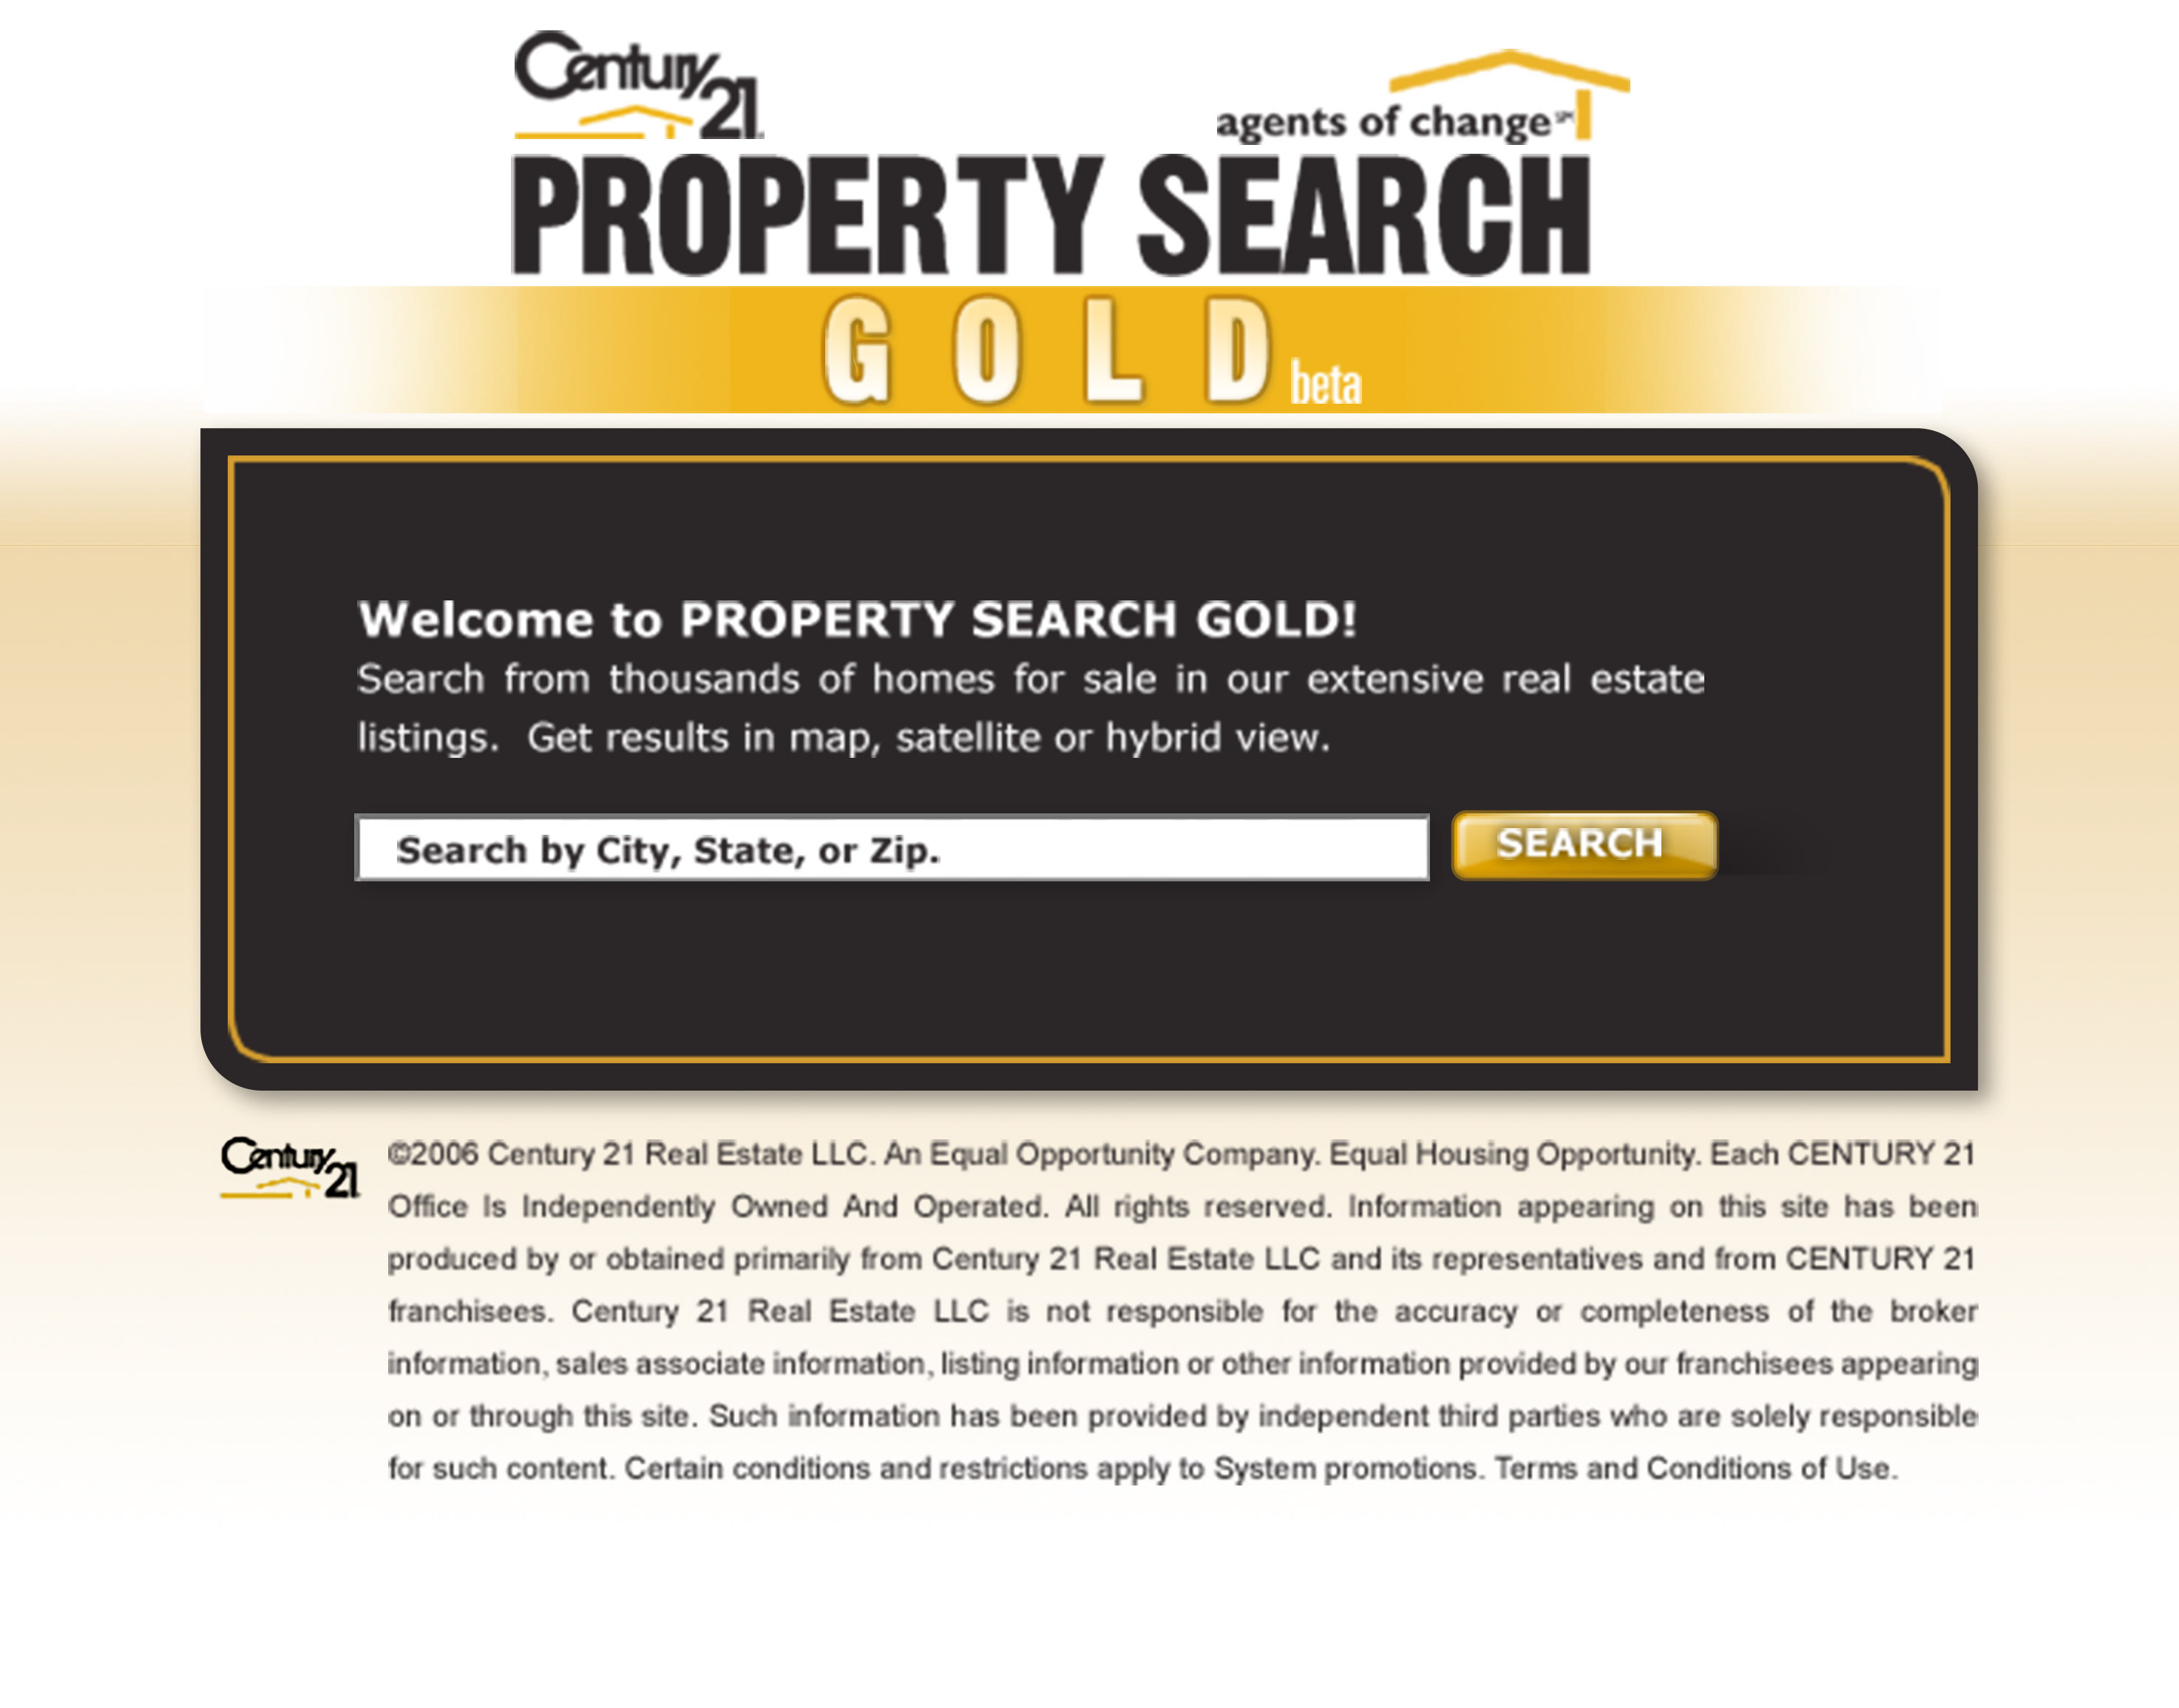 jacob usawicz - Century 21 Property Search Gold